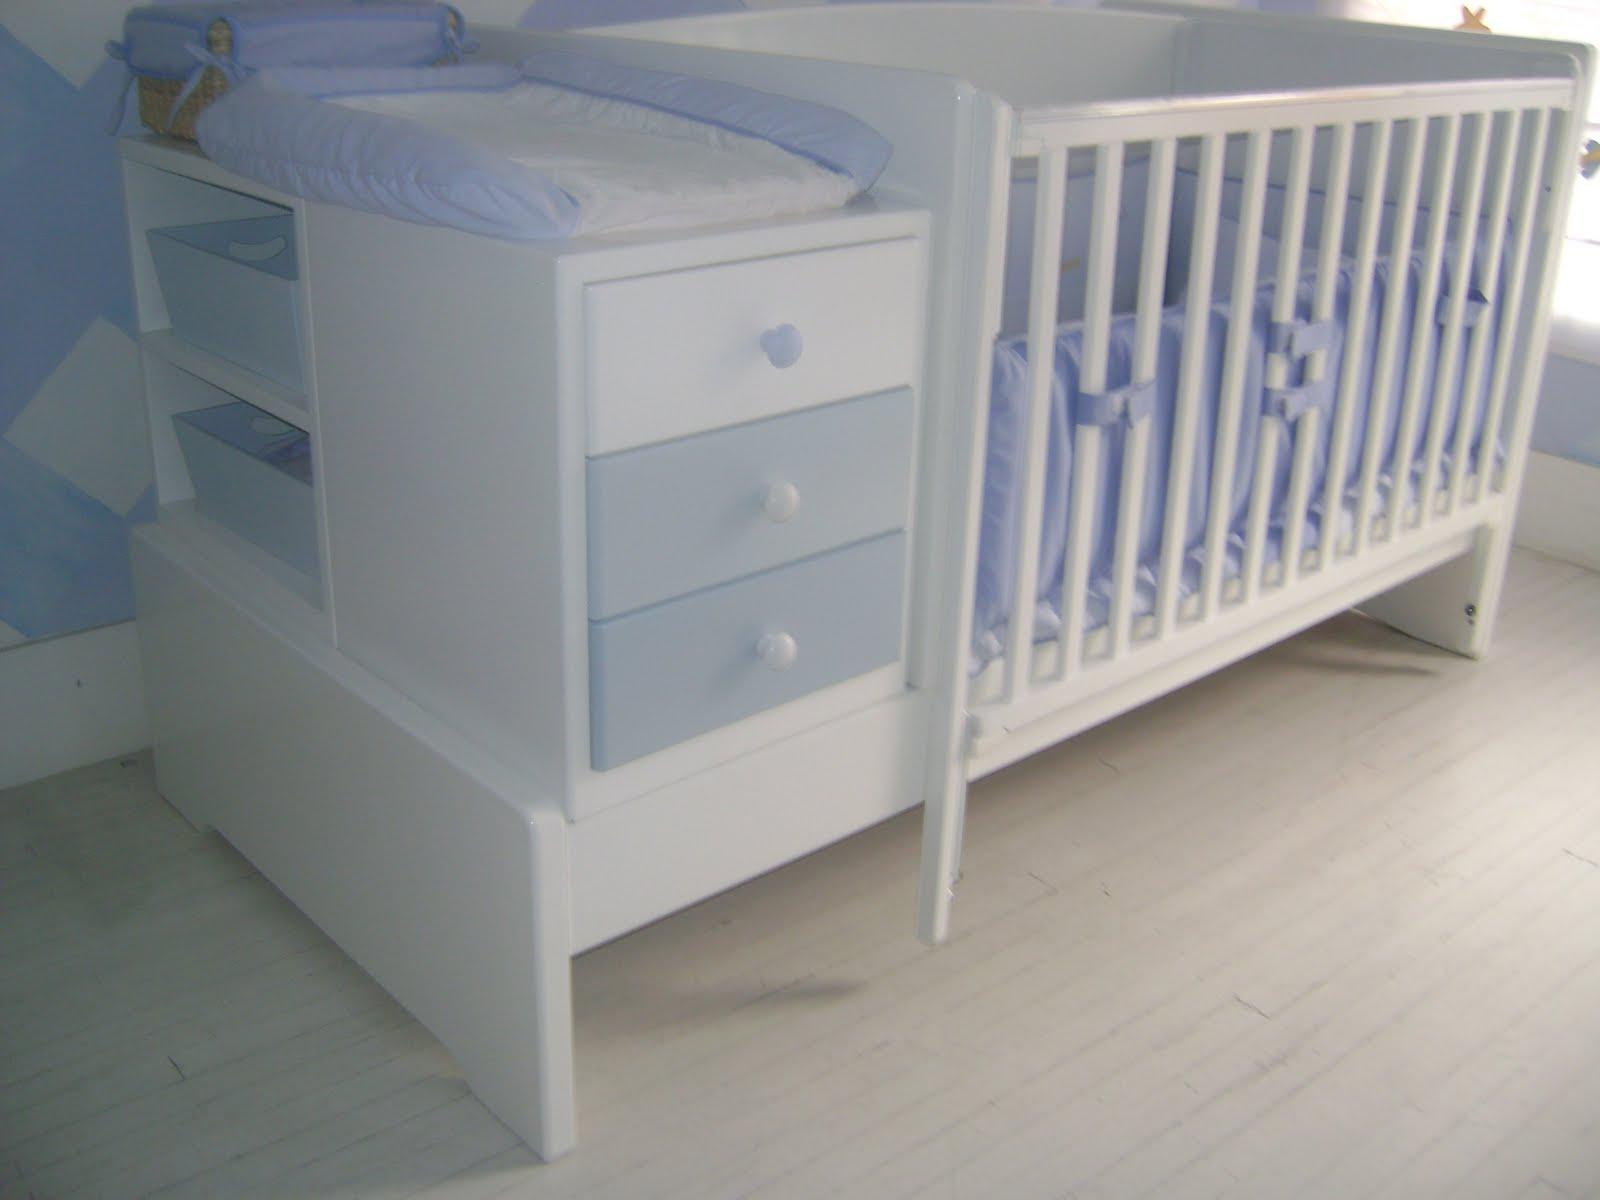 Kitty lipy nueva cama cuna ideal para ni os de 0 a 15 - Cama cuna para ninos ...